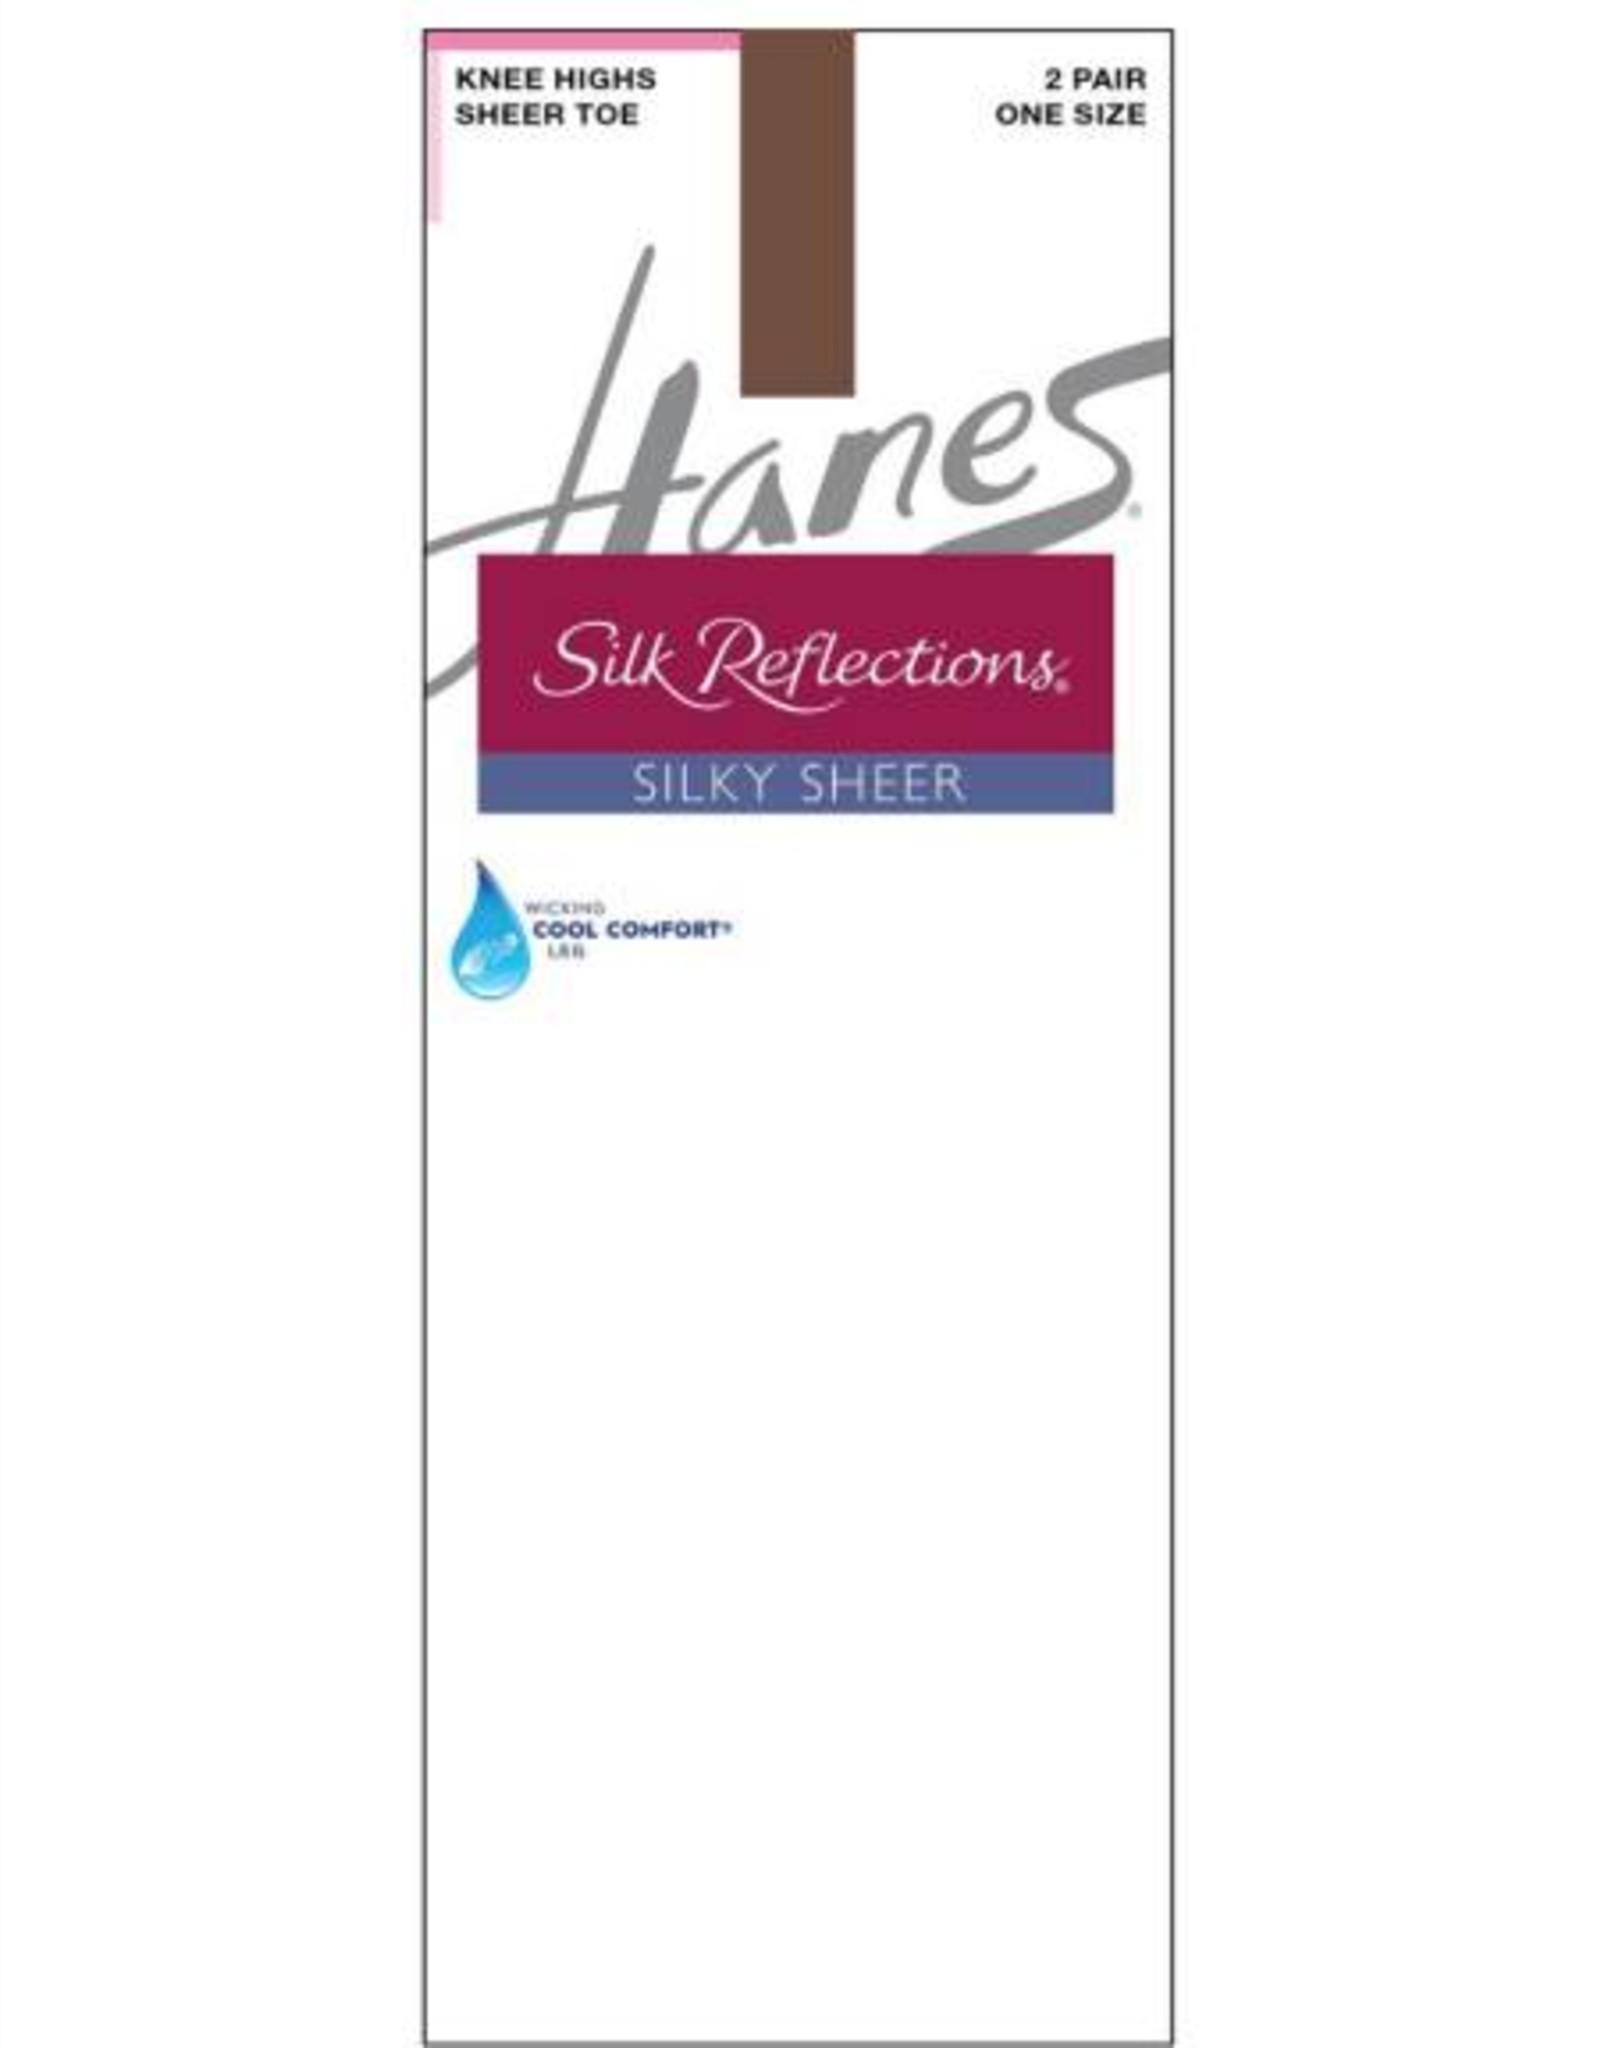 Hanes Hanes Silk Reflections Silky Sheer Toe Knee Hi 2-Pack